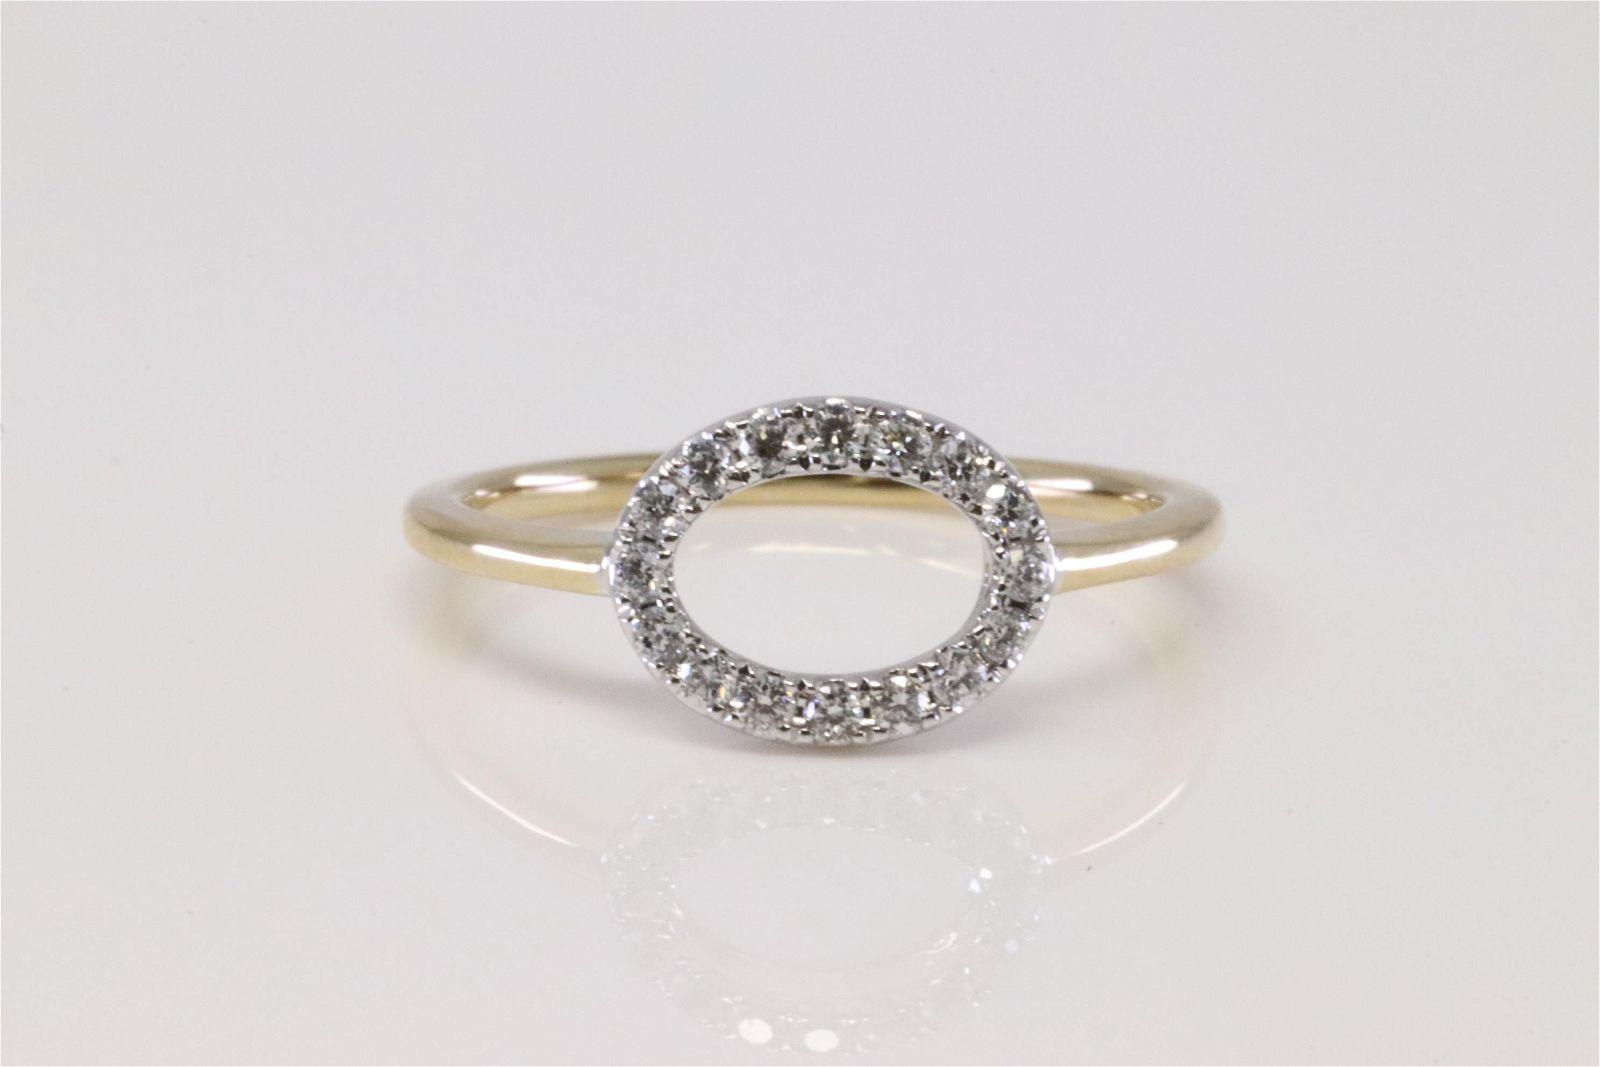 14Kt White / Yellow Gold Diamond Ring.